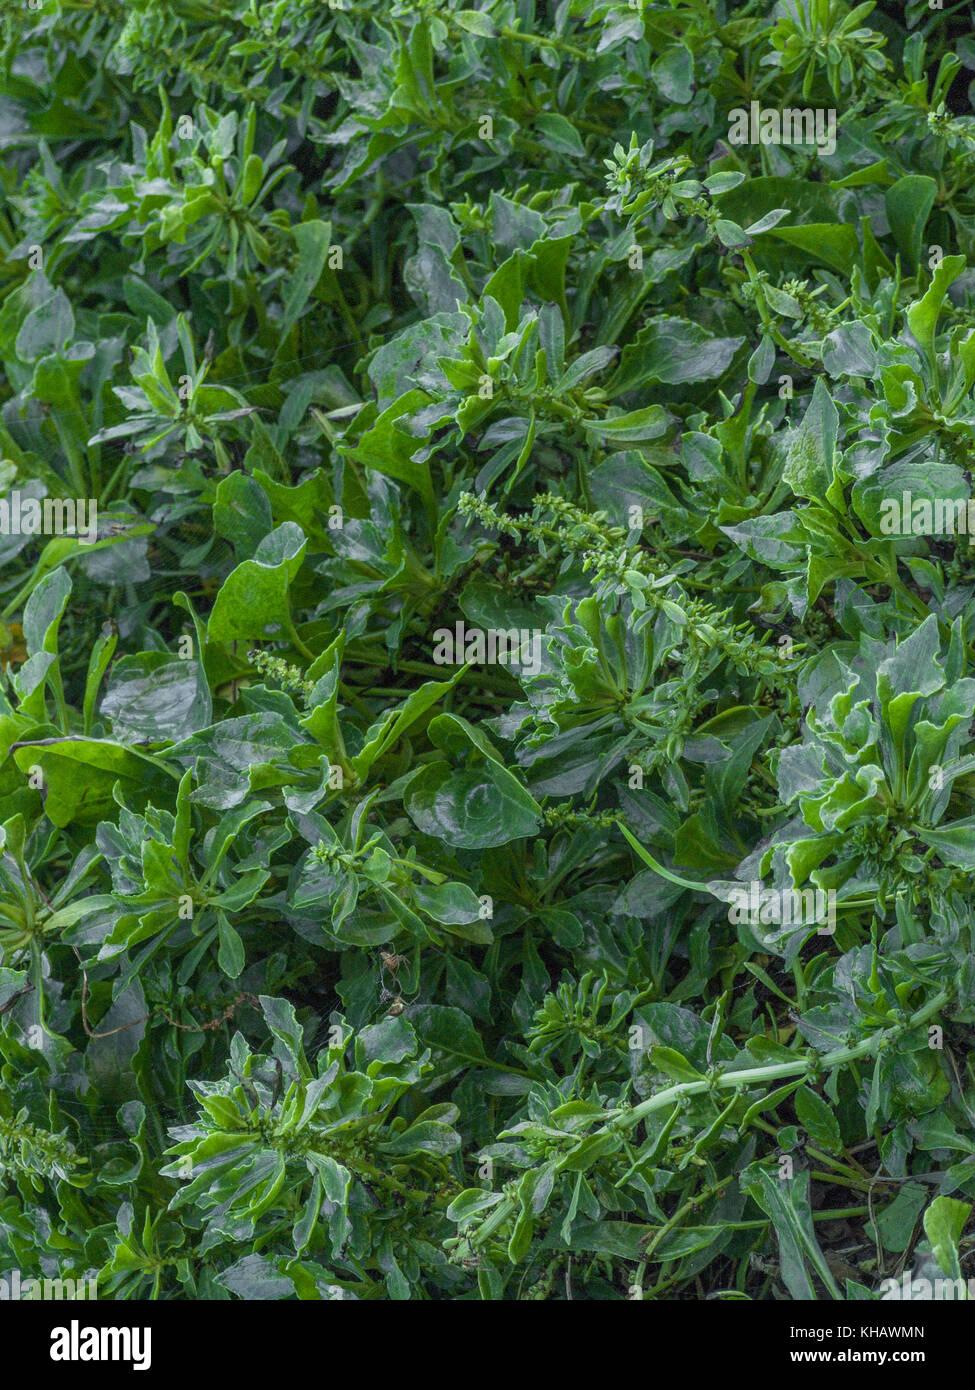 Clump of Sea-beet (Beta vulgaris ssp. maritima) growing on the coastline of Cornwall. - Stock Image